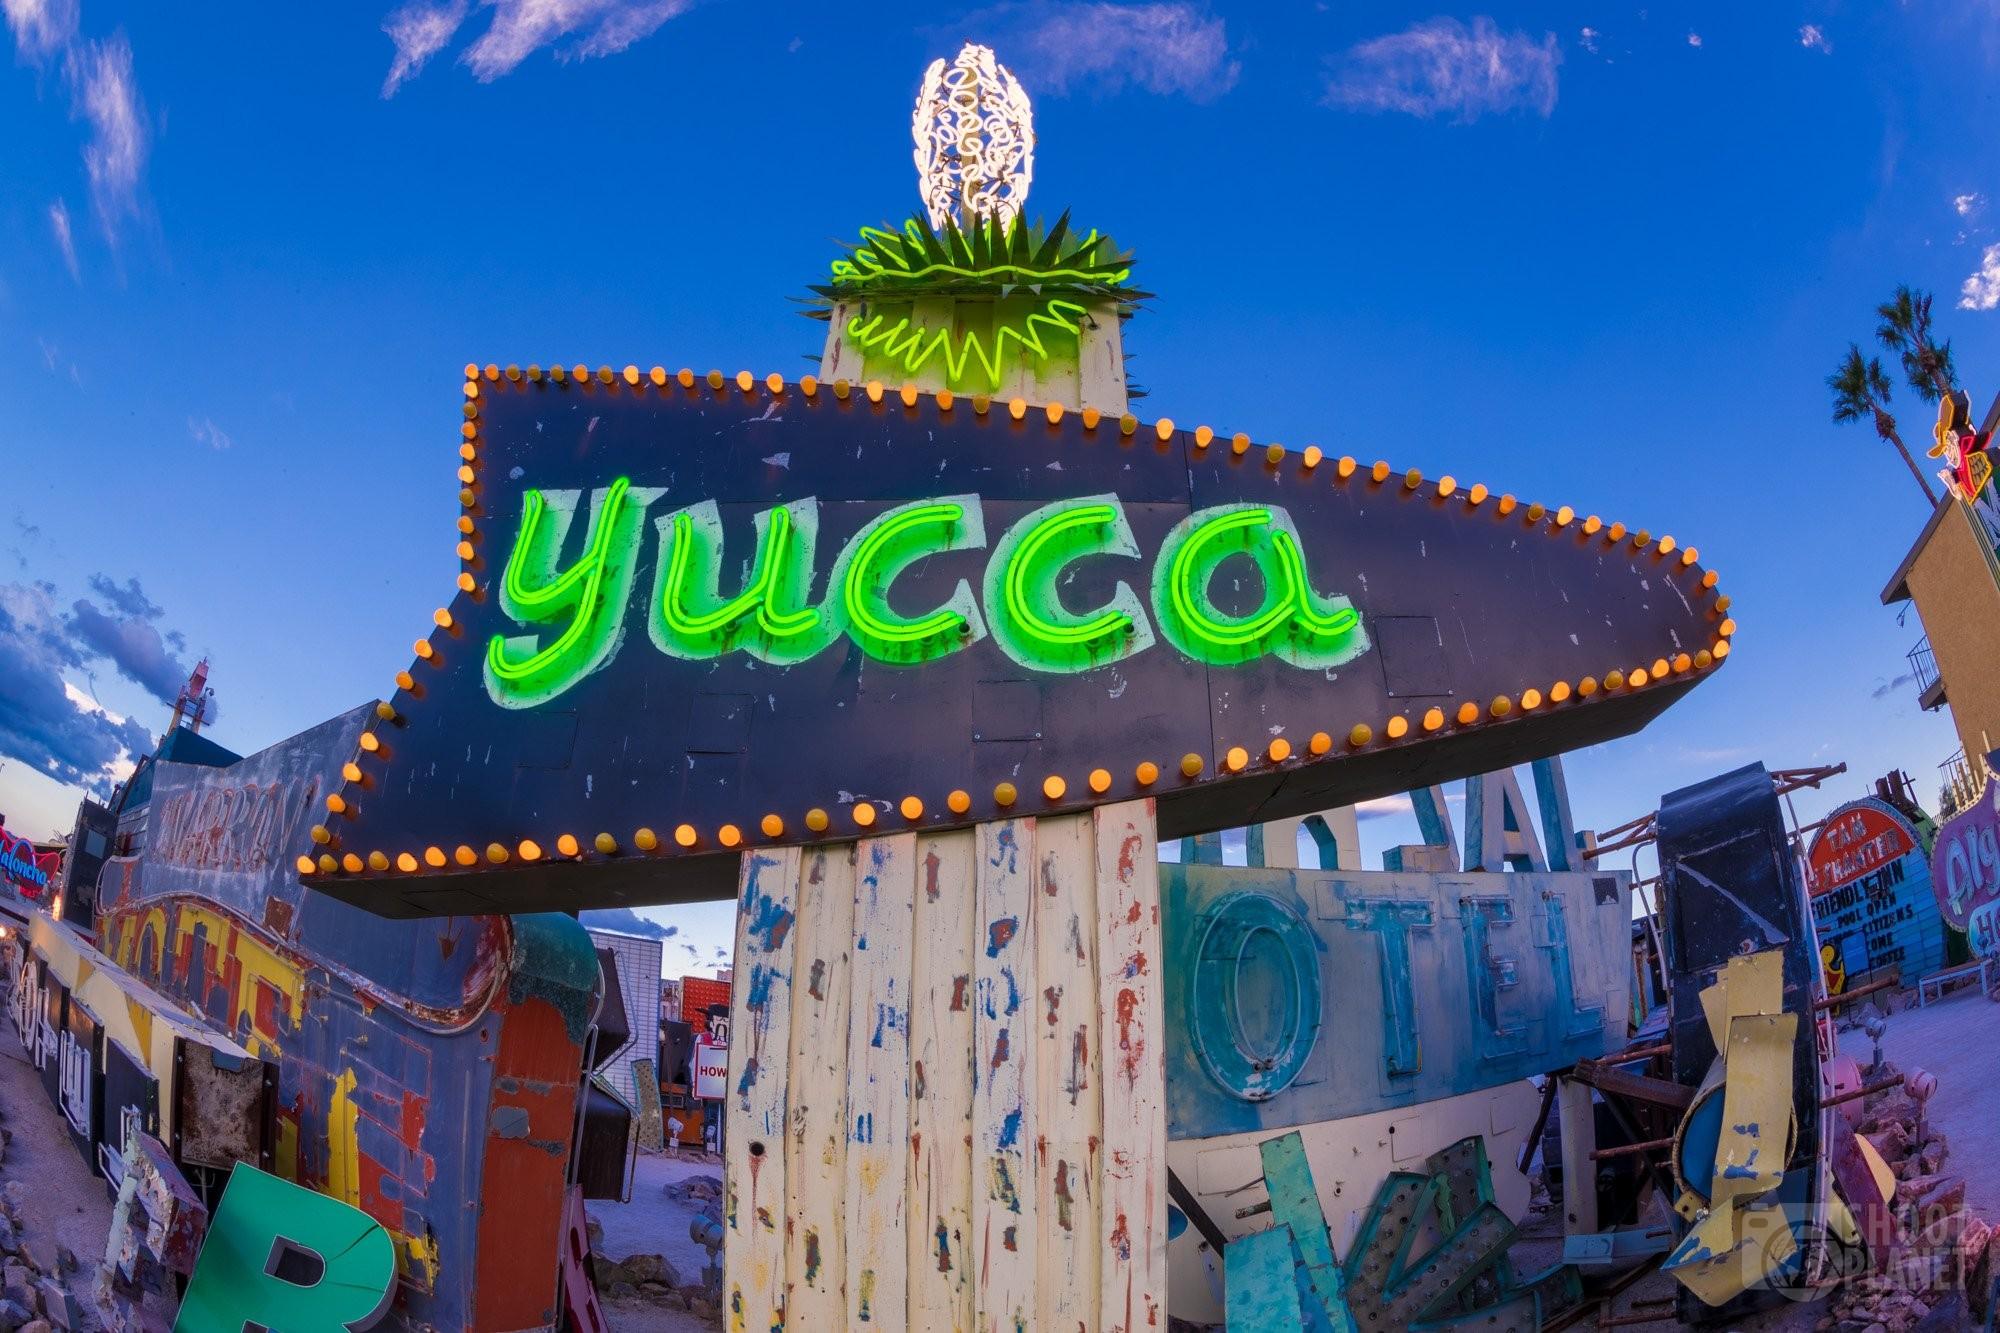 Vintage Yucca neon sign, Las Vegas USA